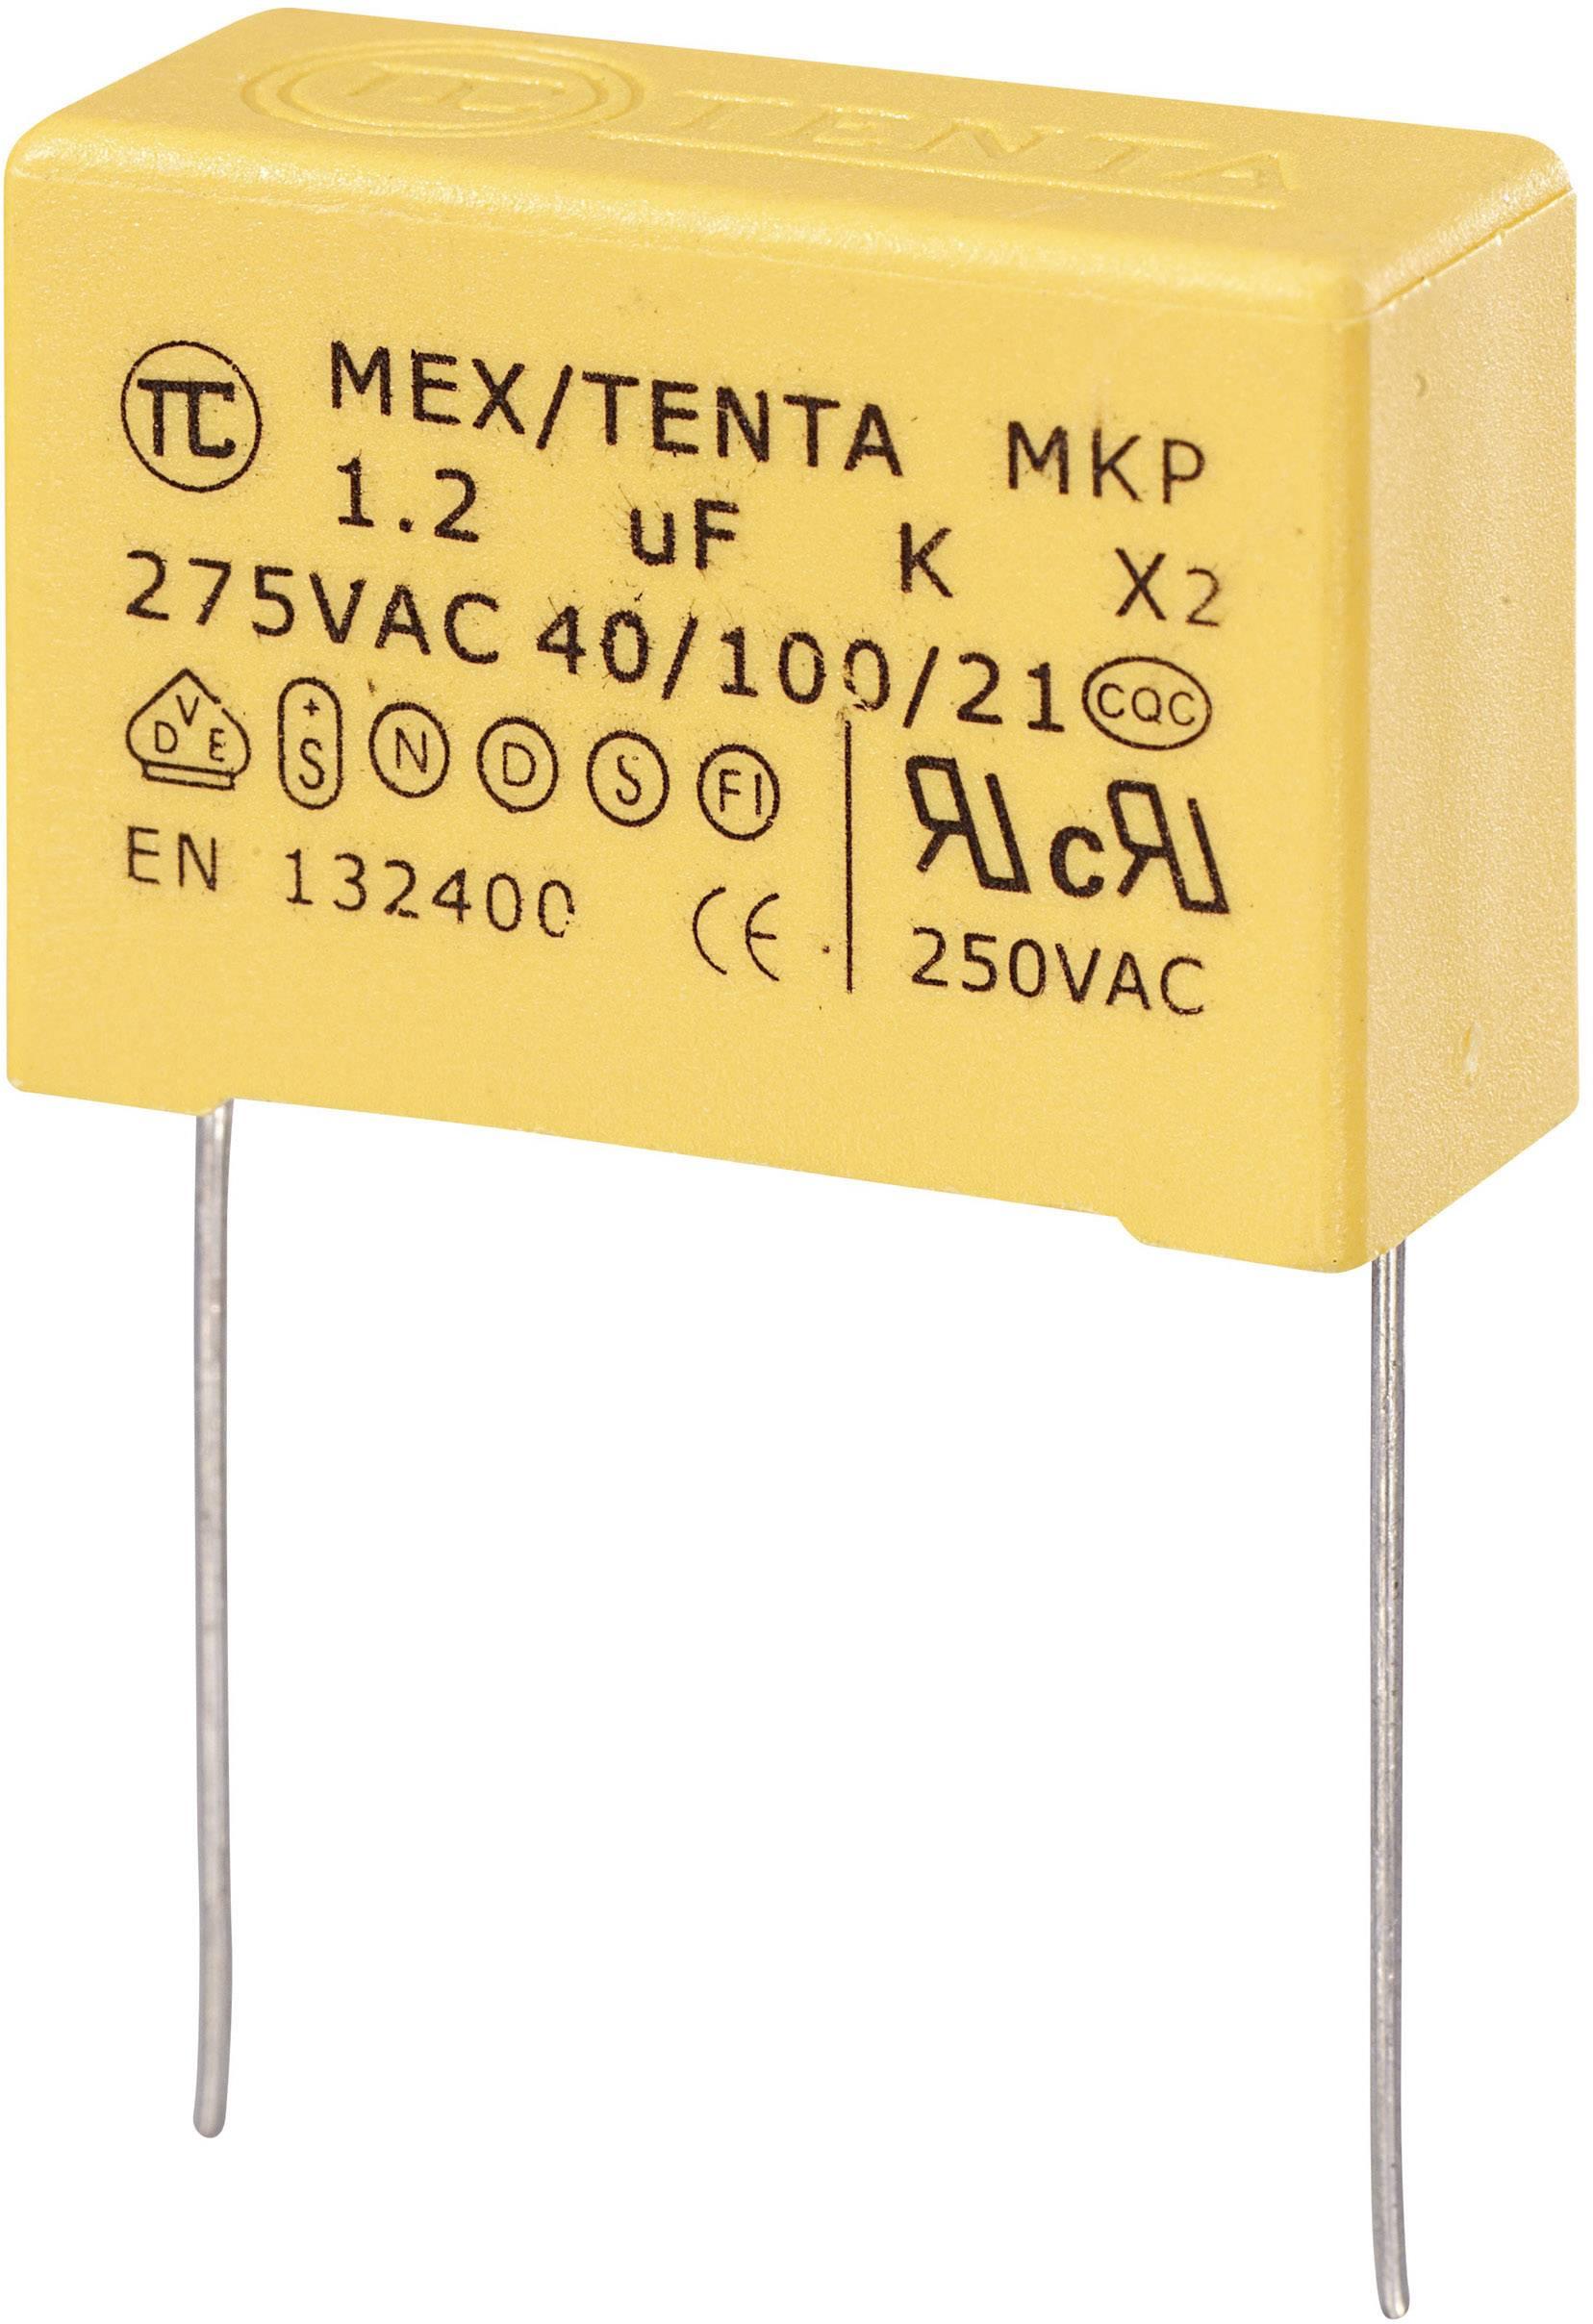 Foliový kondenzátor MKP, 1,2 µF, X2 275 V/AC, 10 %, 32 x 13 x 23 mm